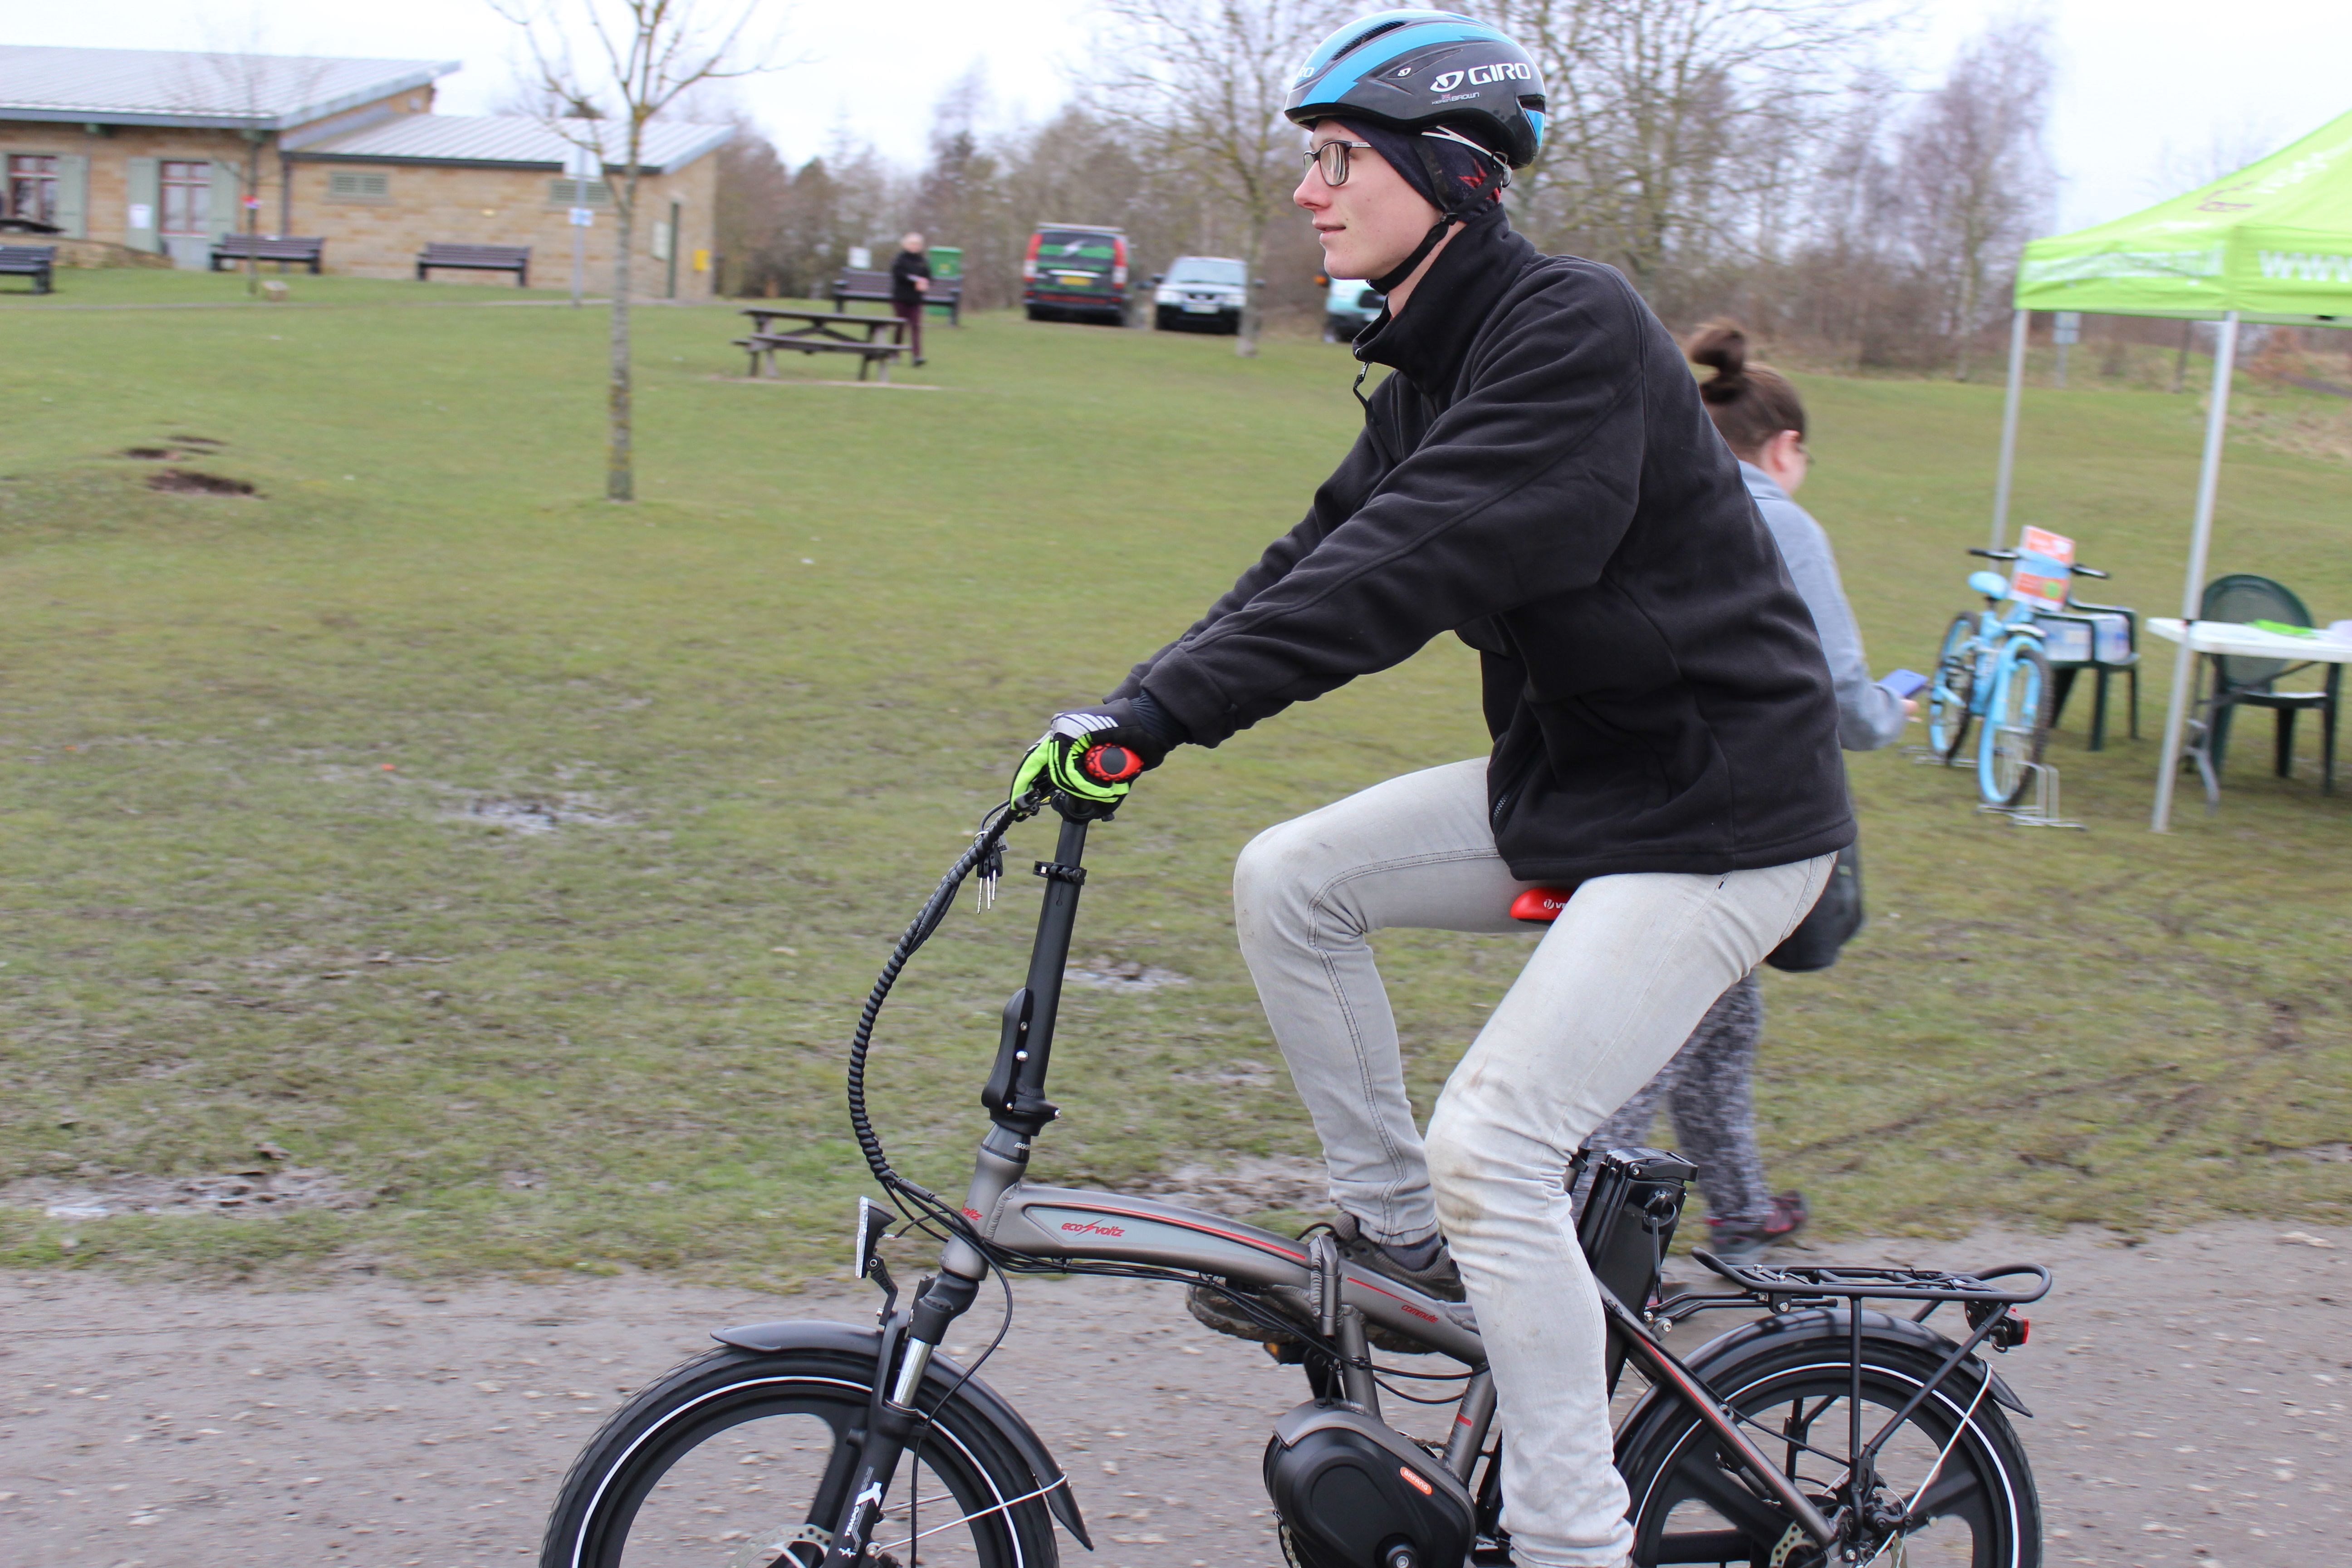 2020 Urban Bike Uk Brands Derbyshire